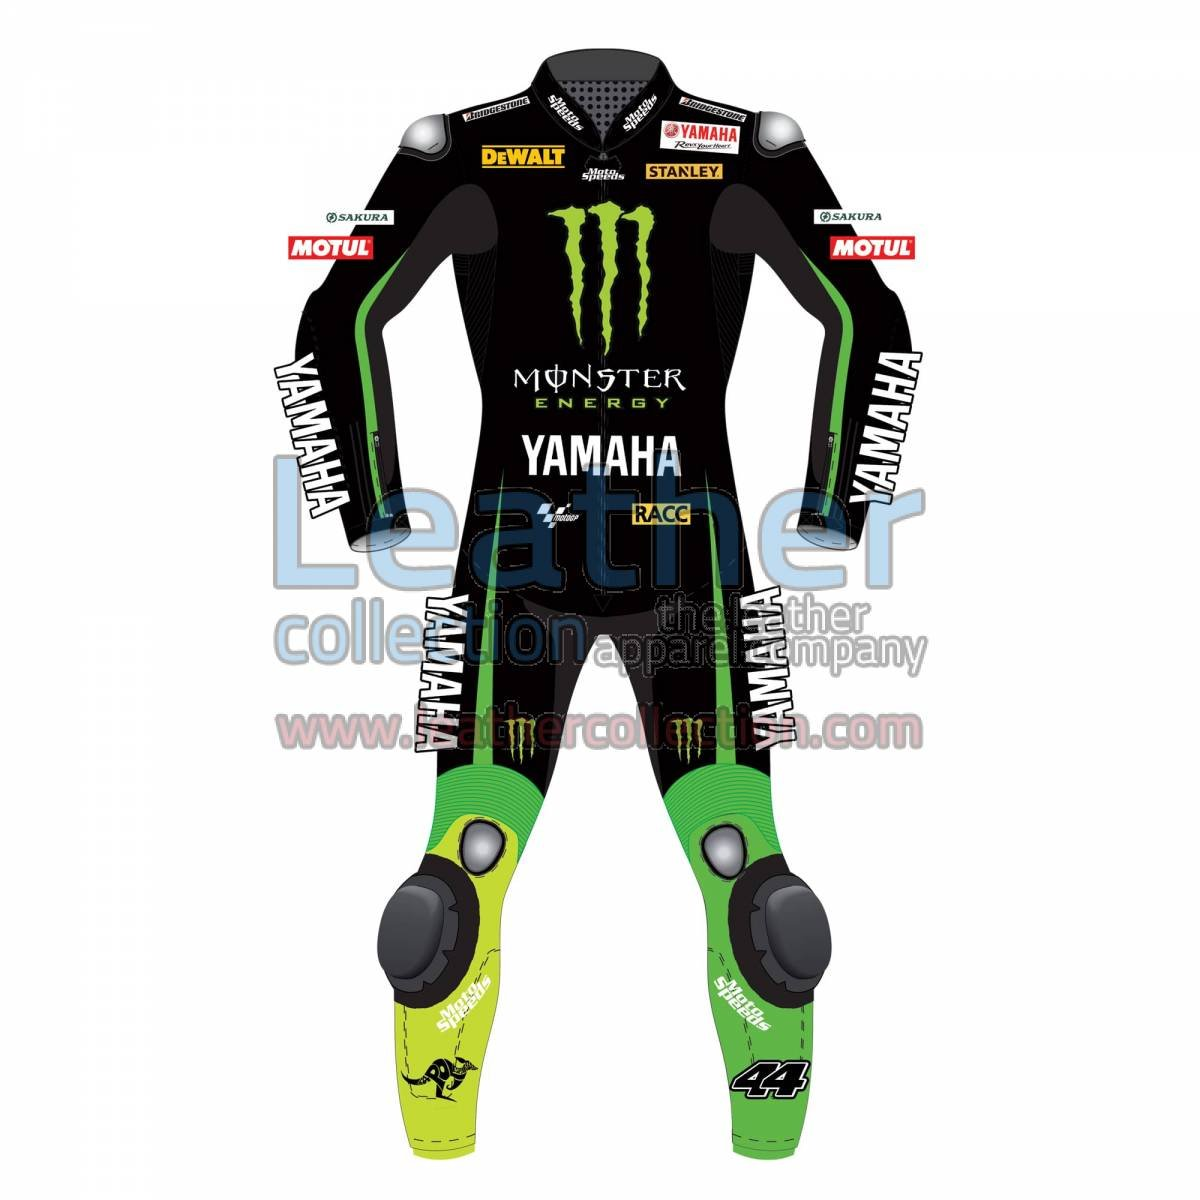 Pol Espargaro Yamaha Monster 2015 Leathers